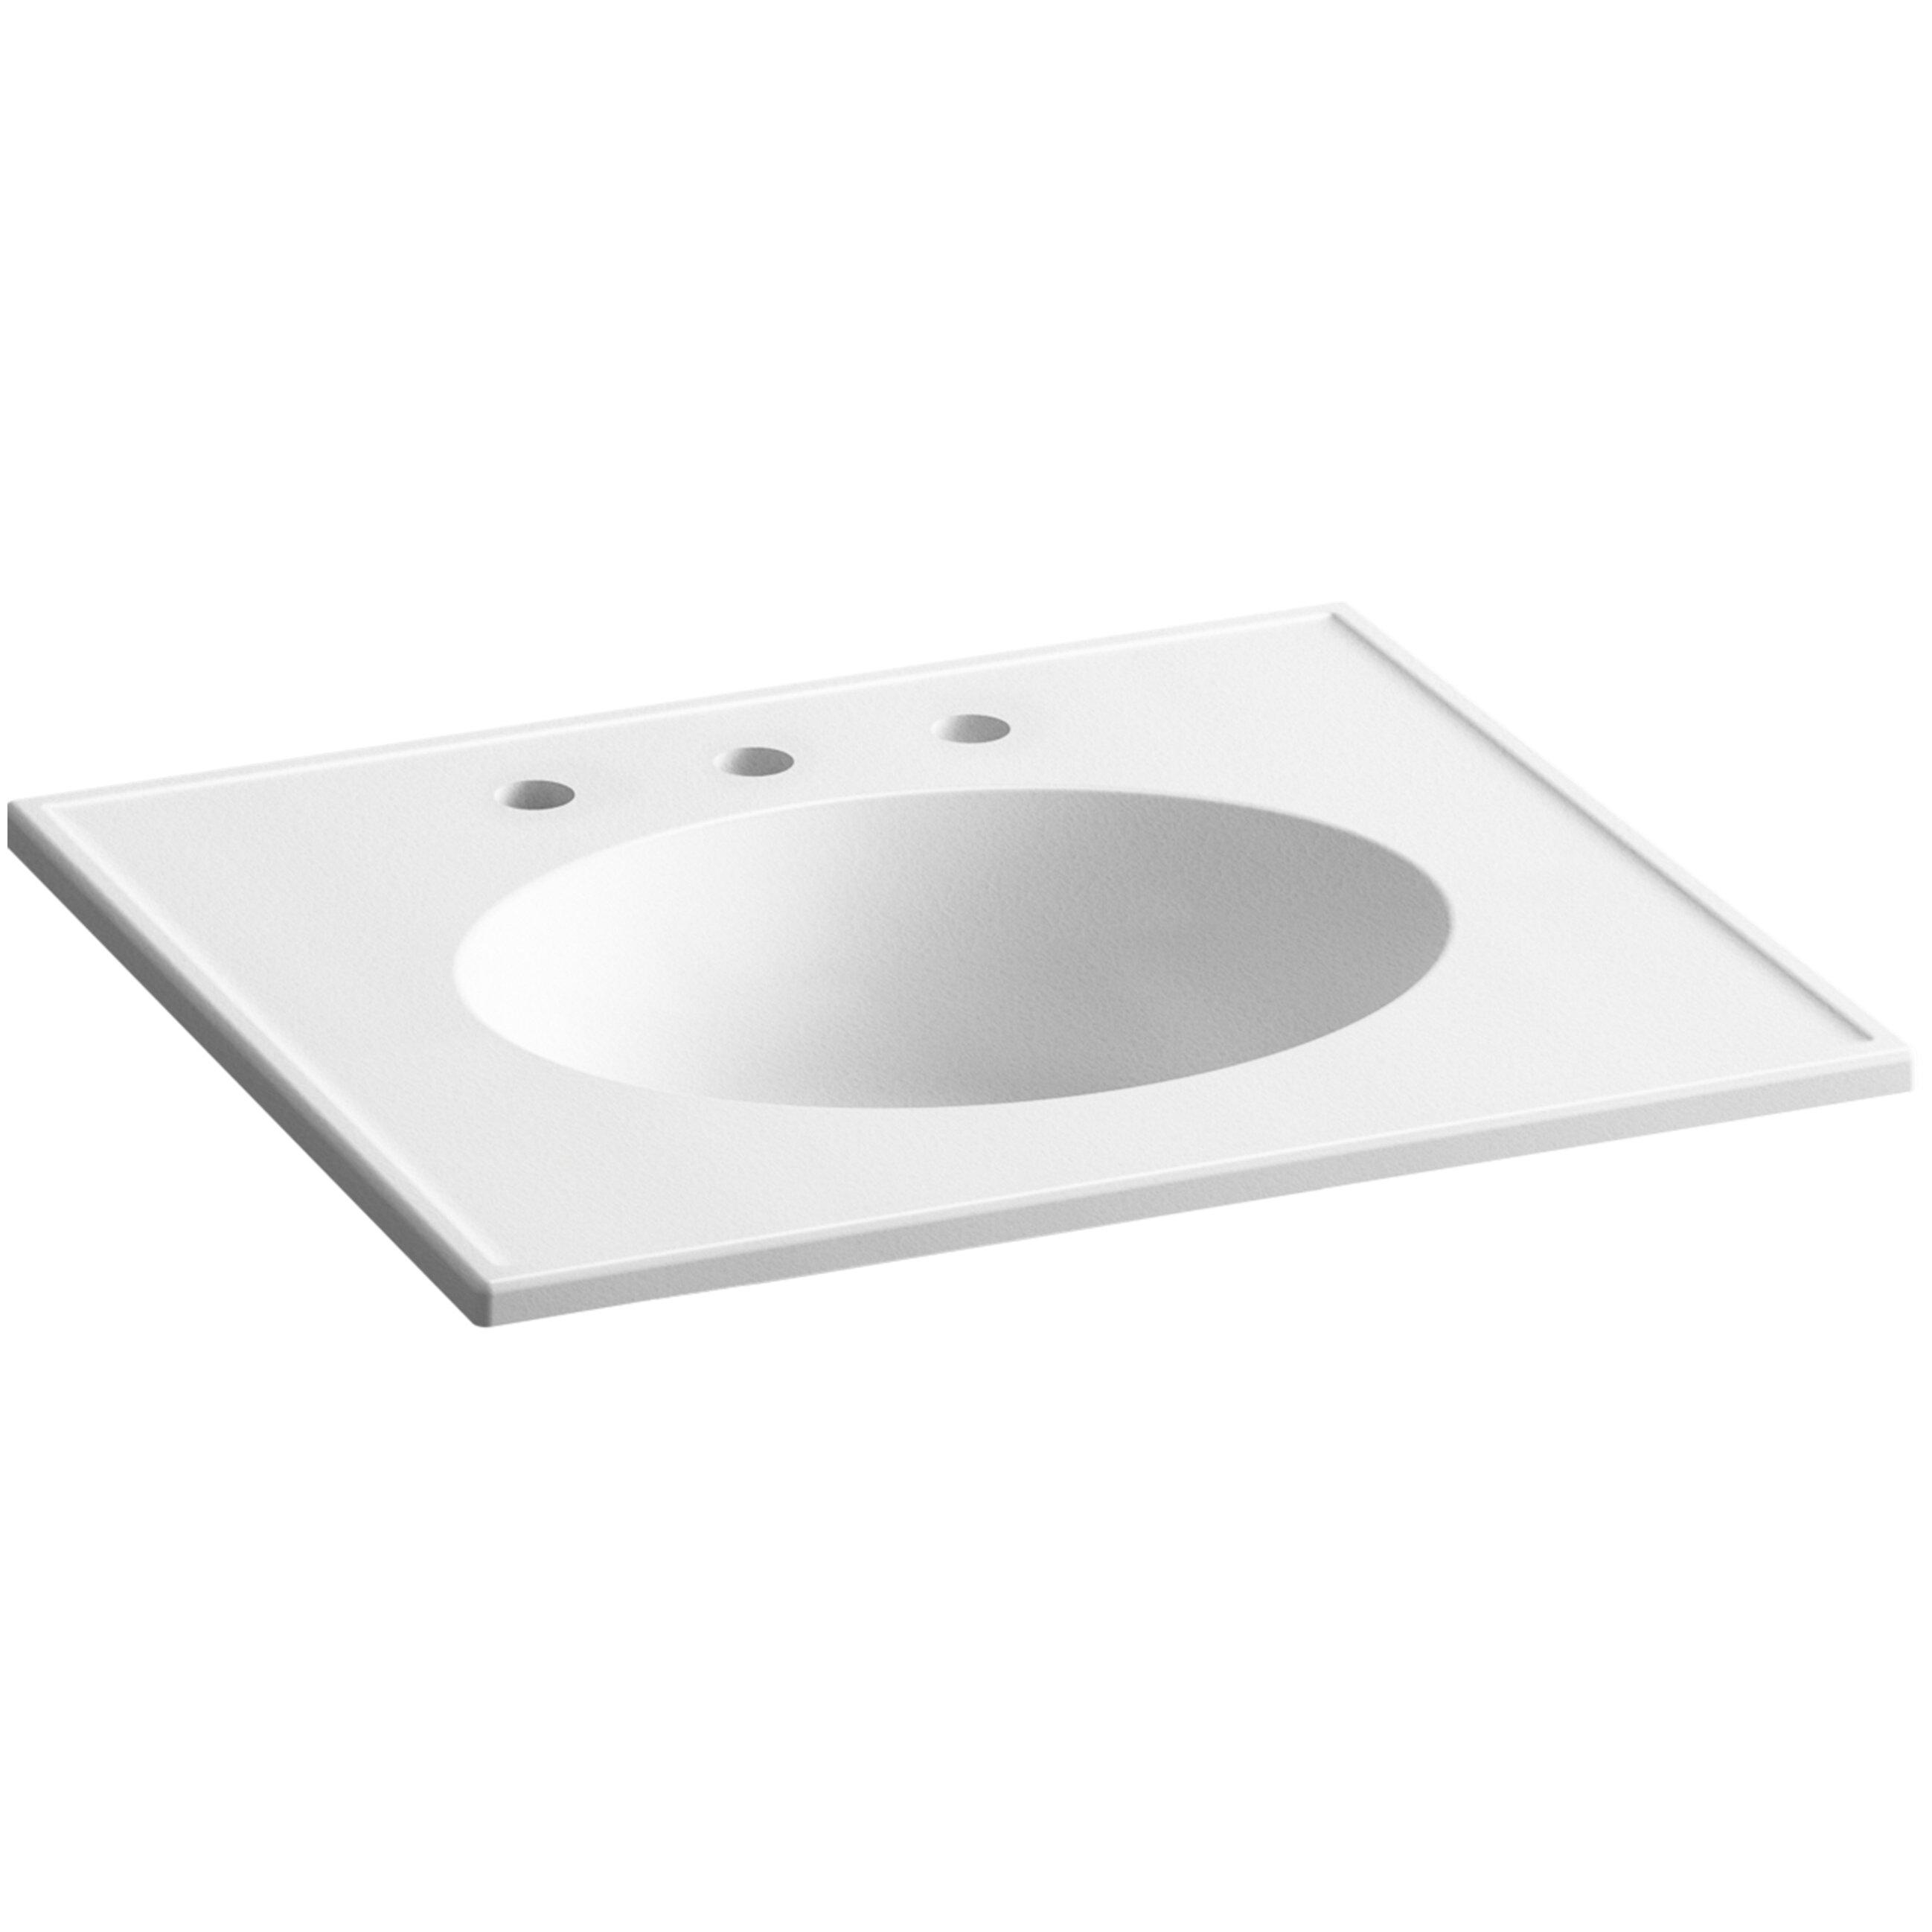 Oval Vanity Sink : Kohler Ceramic/Impressions 25